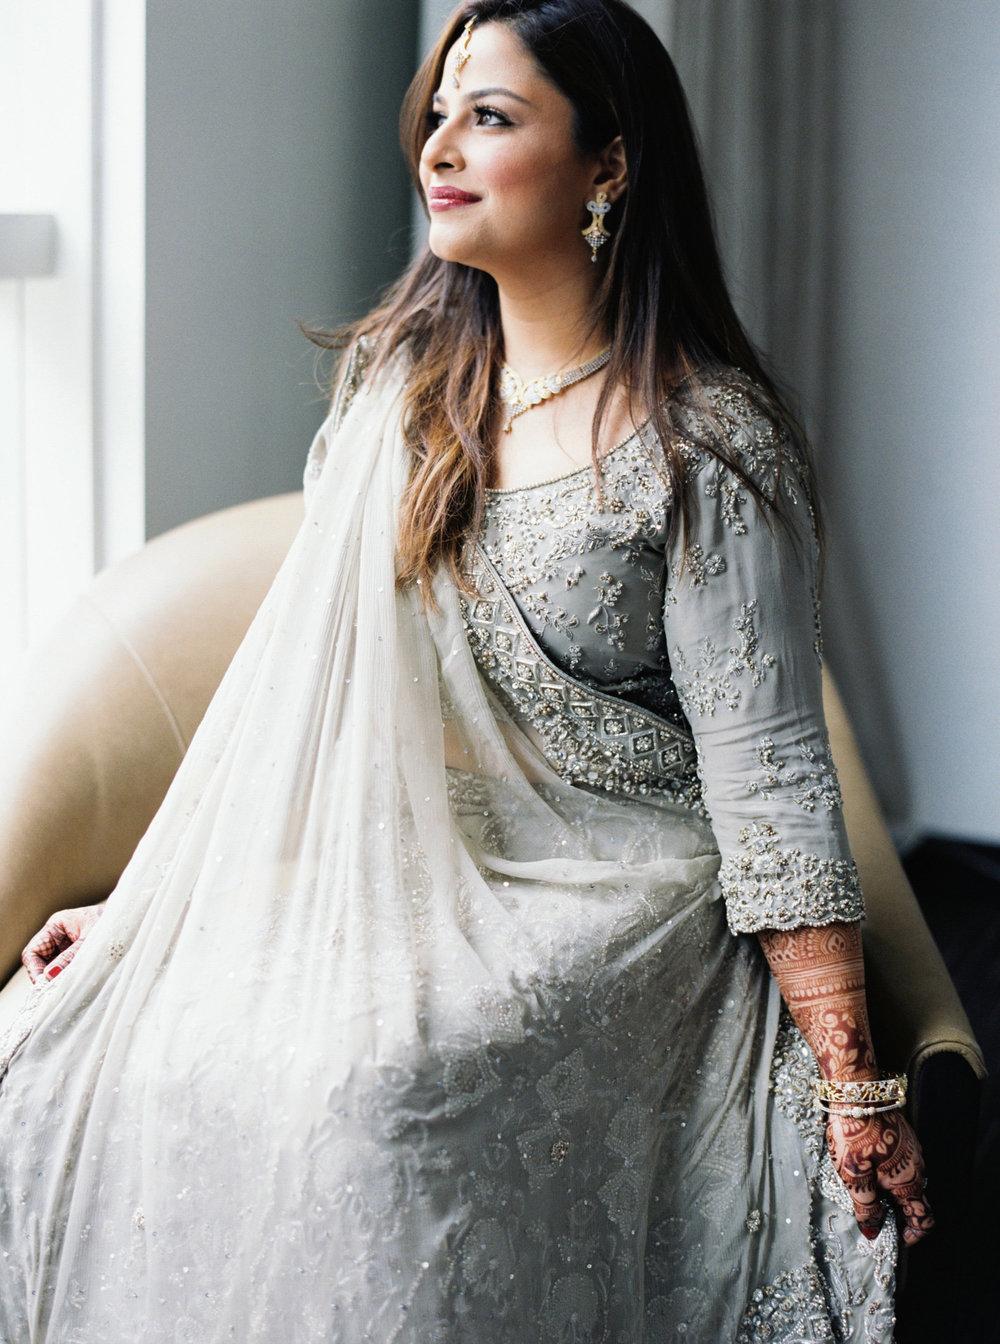 Muslim Bride | Colorful & Sweet Brooklyn Wedding | The Green Building